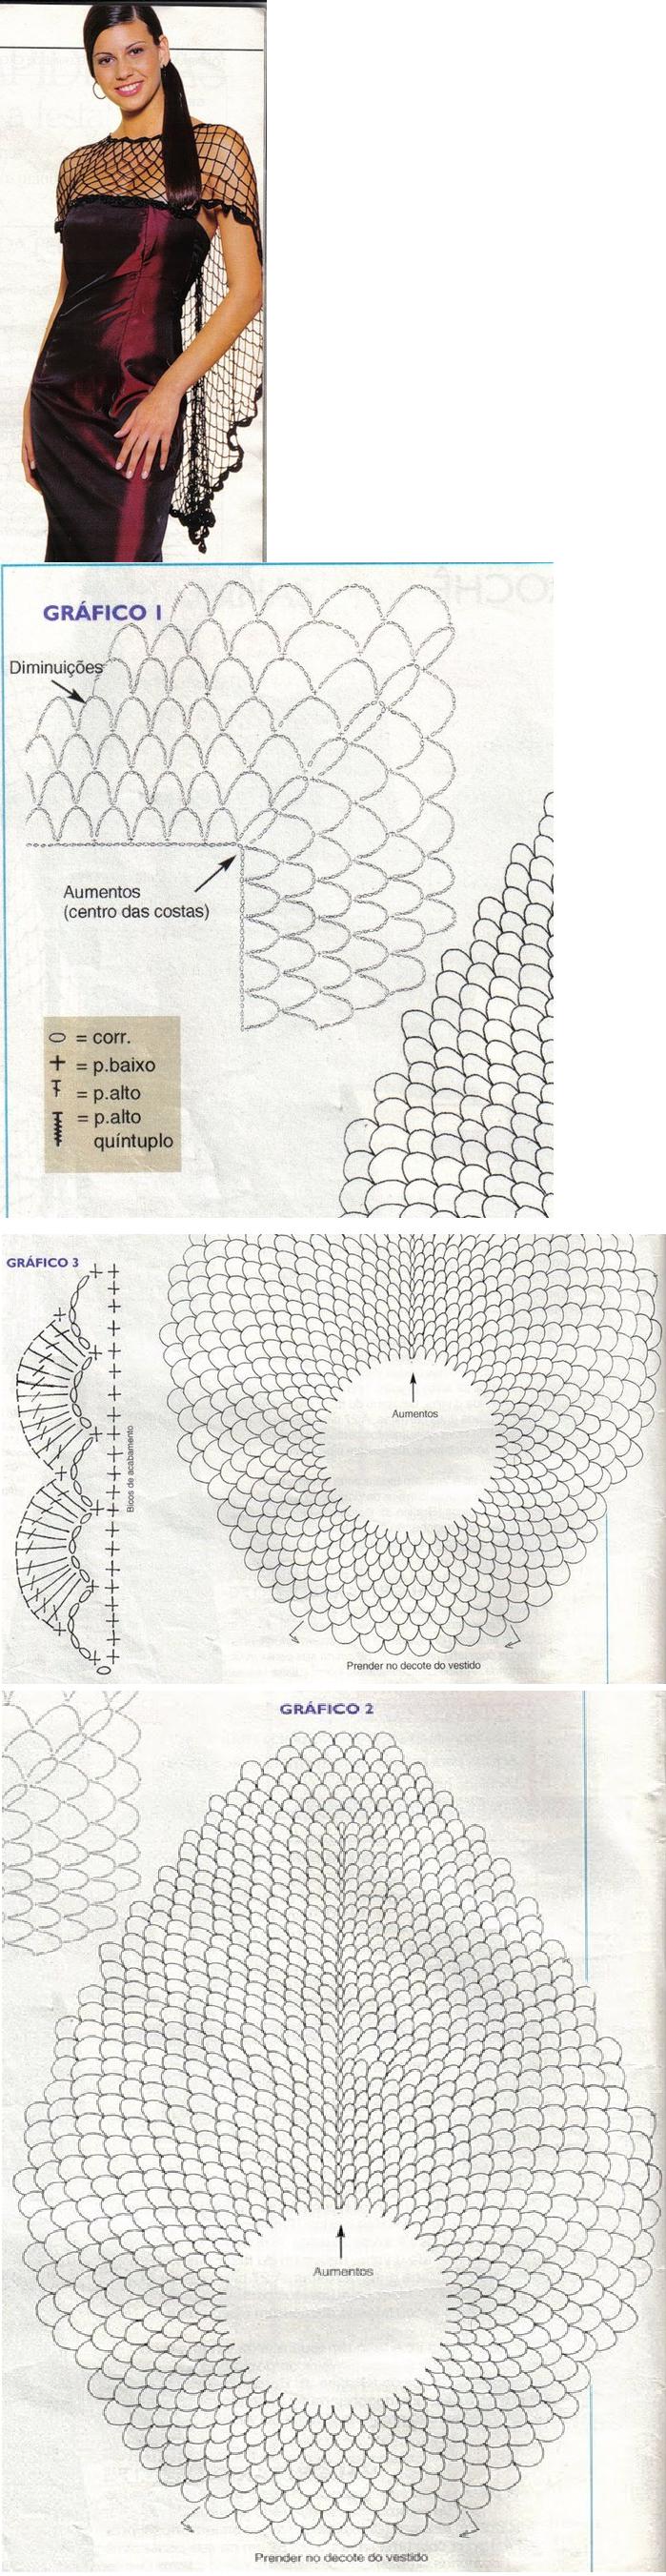 fishnet crochet shoulder cover - to make any strapless classy ...